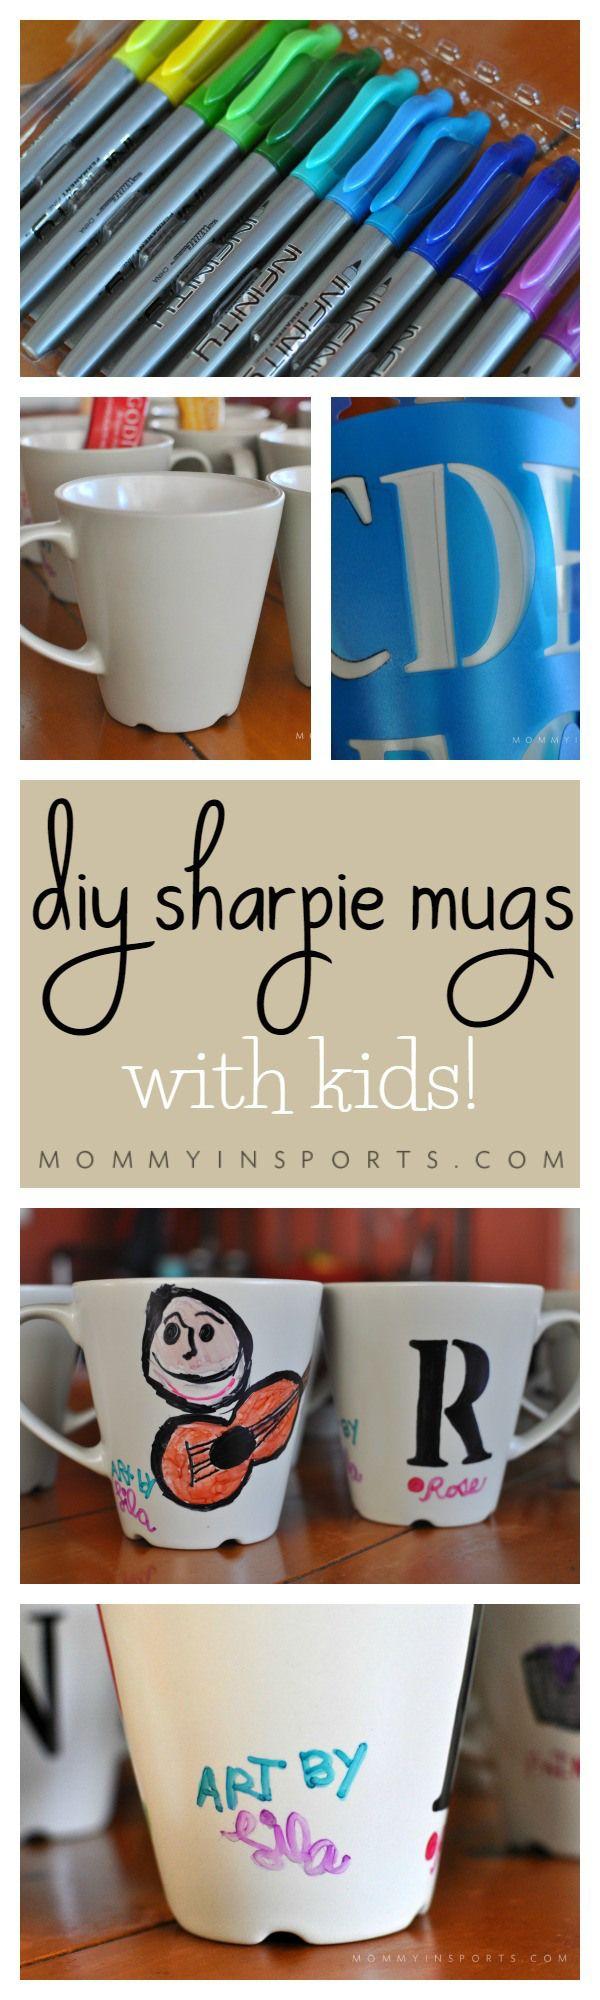 DIY Sharpie Mugs with Kids | Crafts, Christmas gift ideas ...